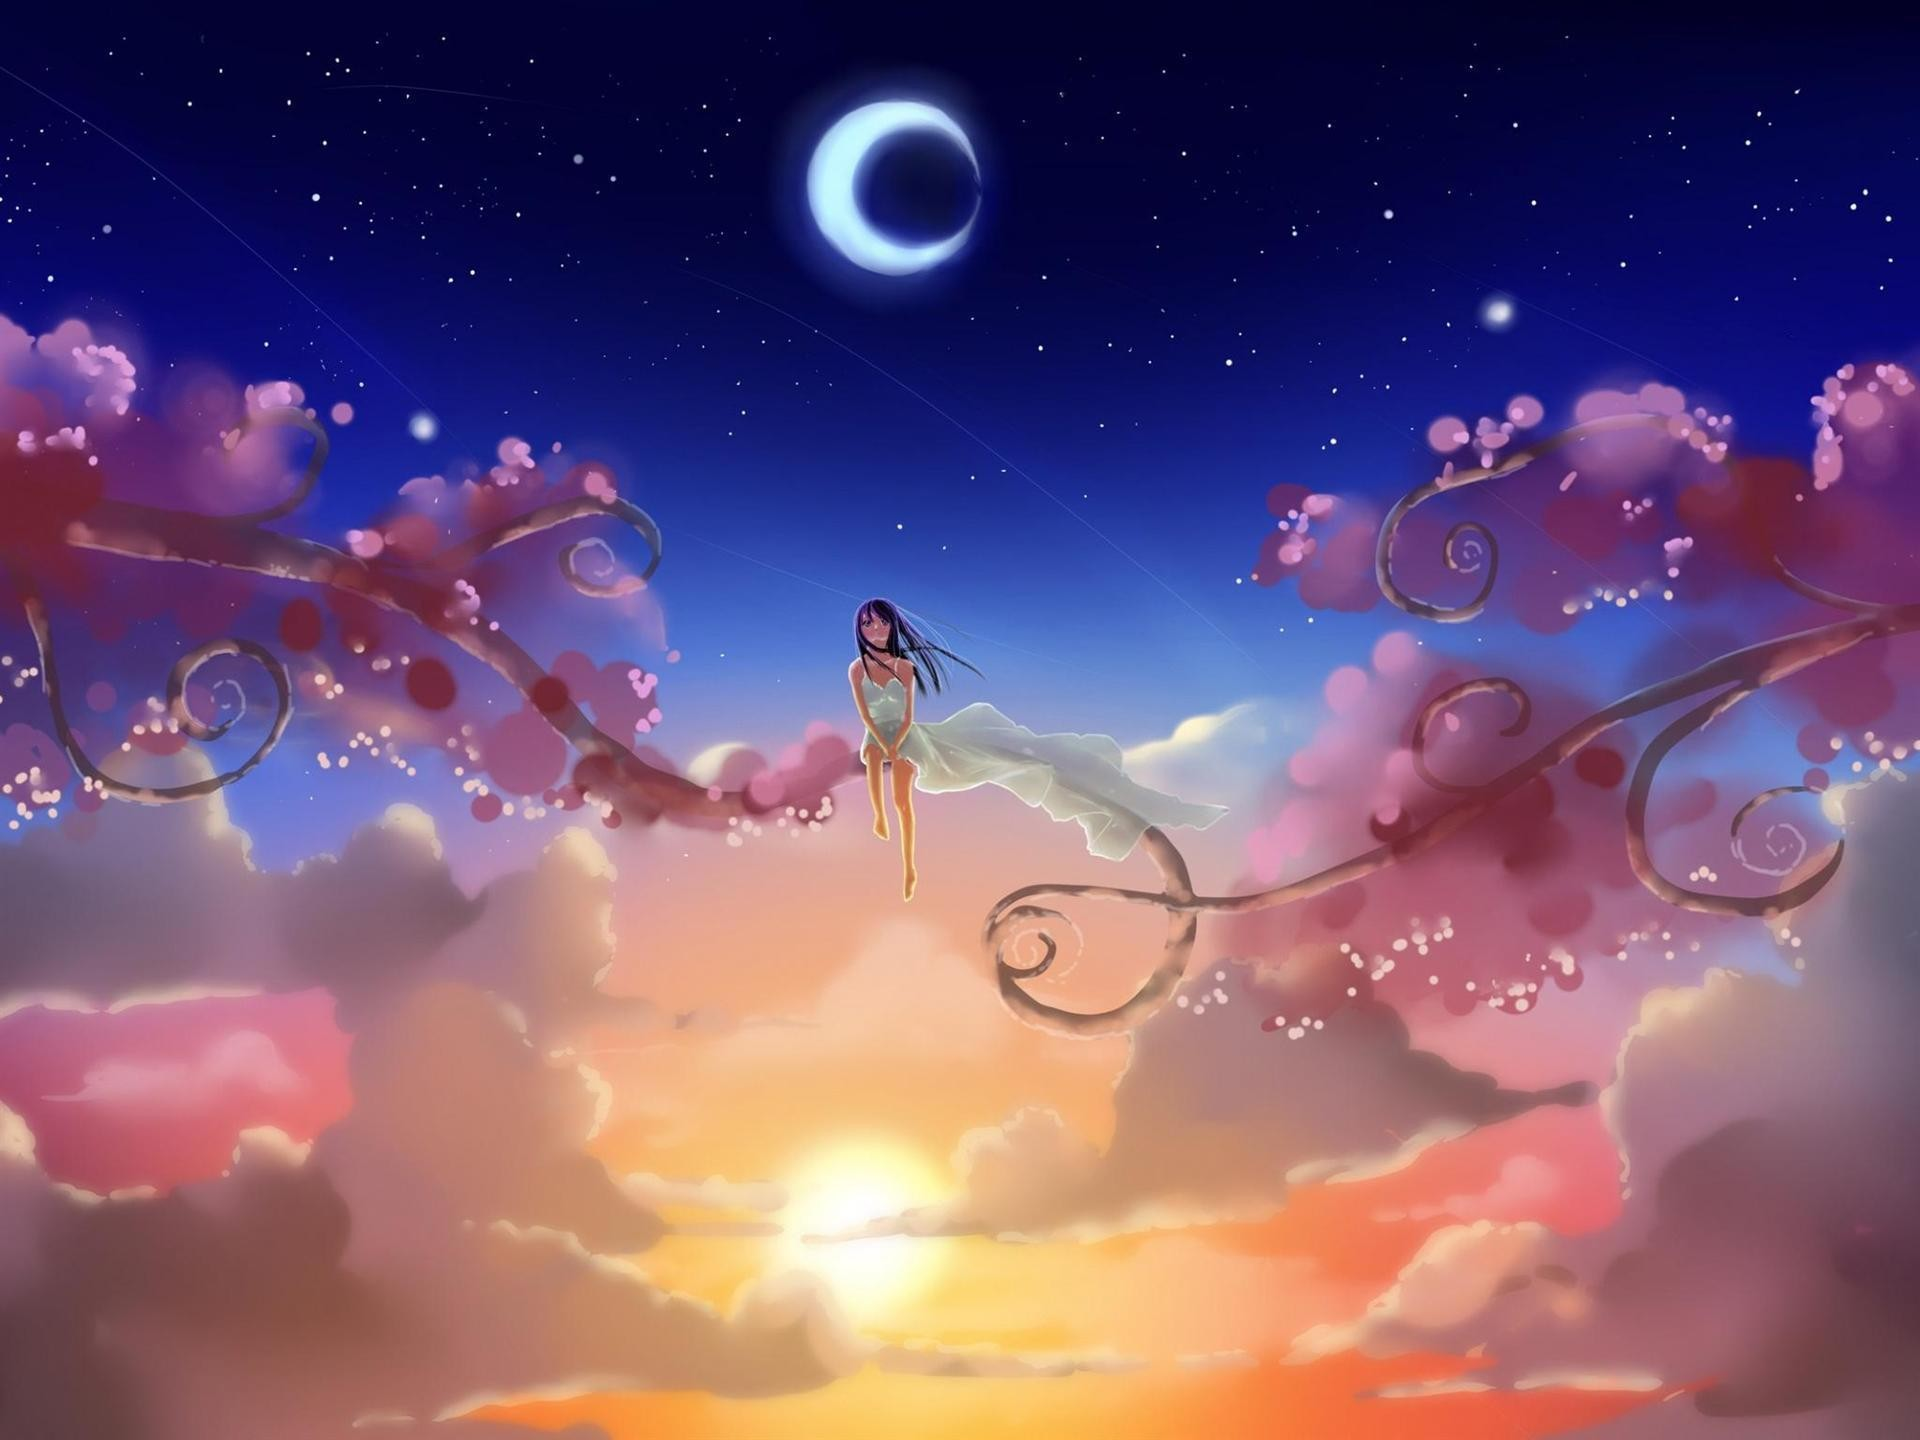 Desktop Wallpaper Shelf Cute 47 Backgrounds For Girls 183 ① Download Free Stunning Hd